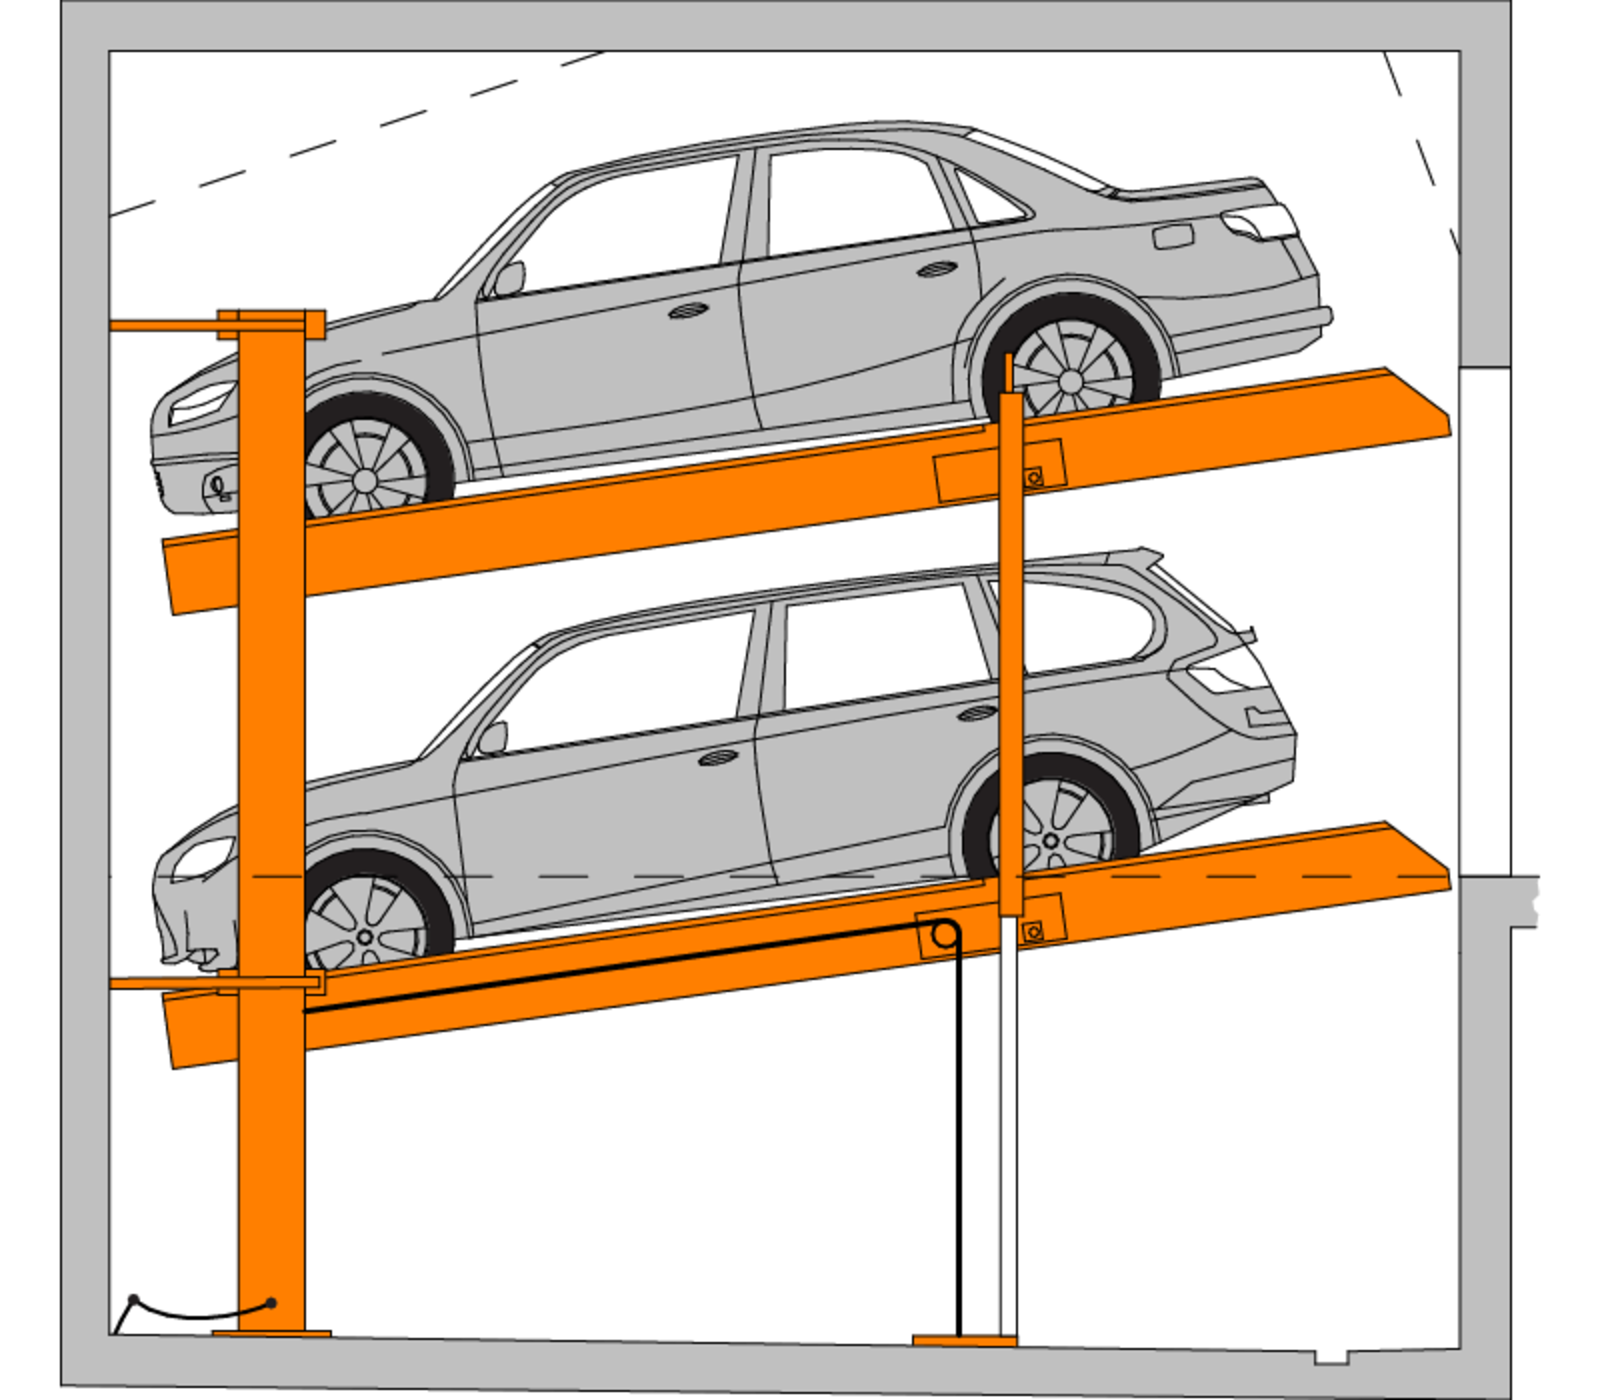 Parking lot clipart underground parking. Multibase i car stacker